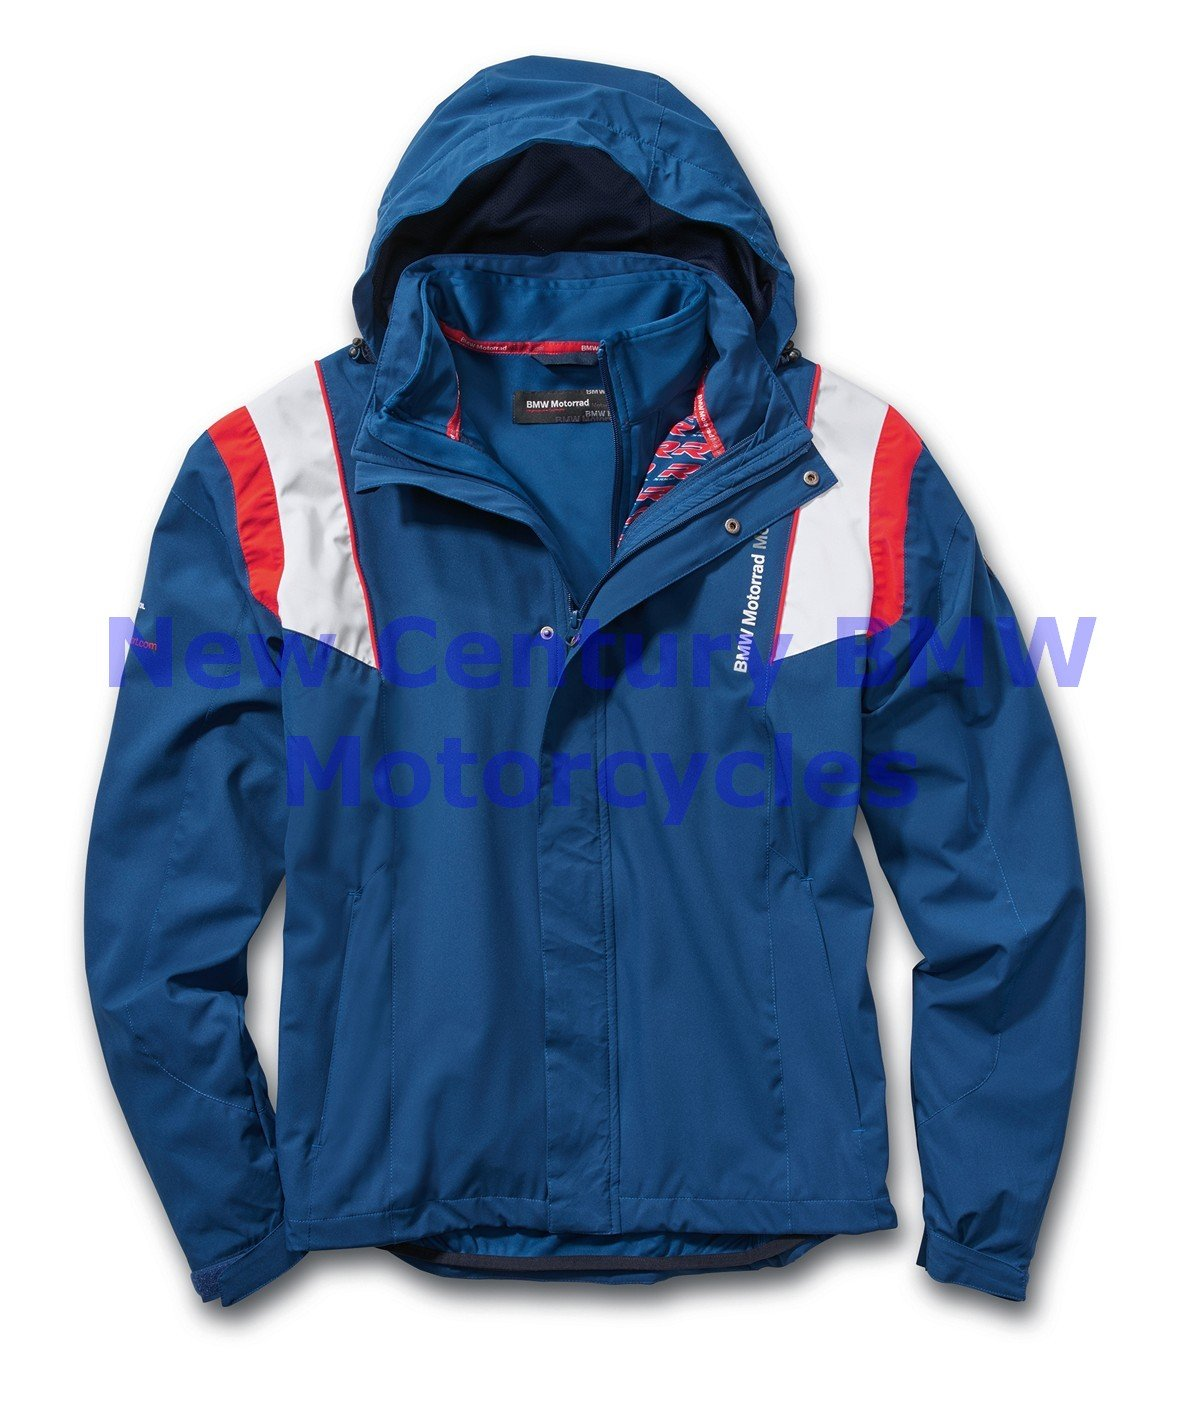 BMW Genuine Motorcycle Unisex Motorsport Riding Jacket Blue/White/Red M Medium